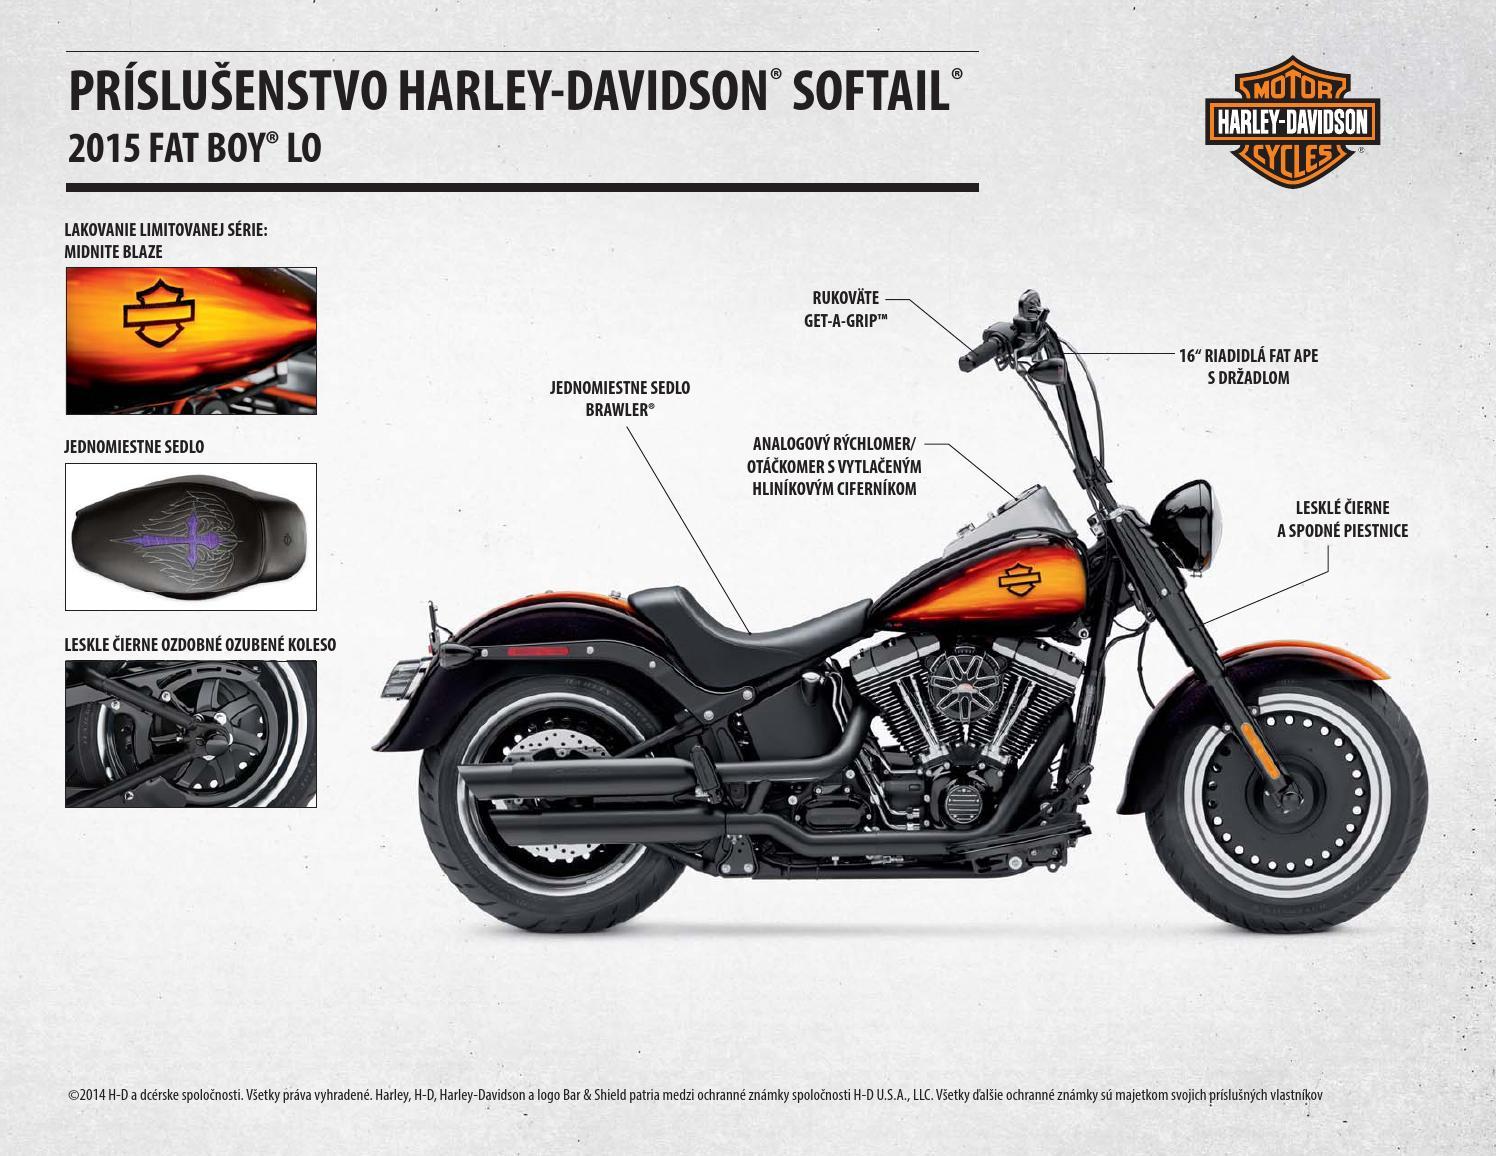 fat boy lo 2015 tuning motocyklov harley davidson. Black Bedroom Furniture Sets. Home Design Ideas